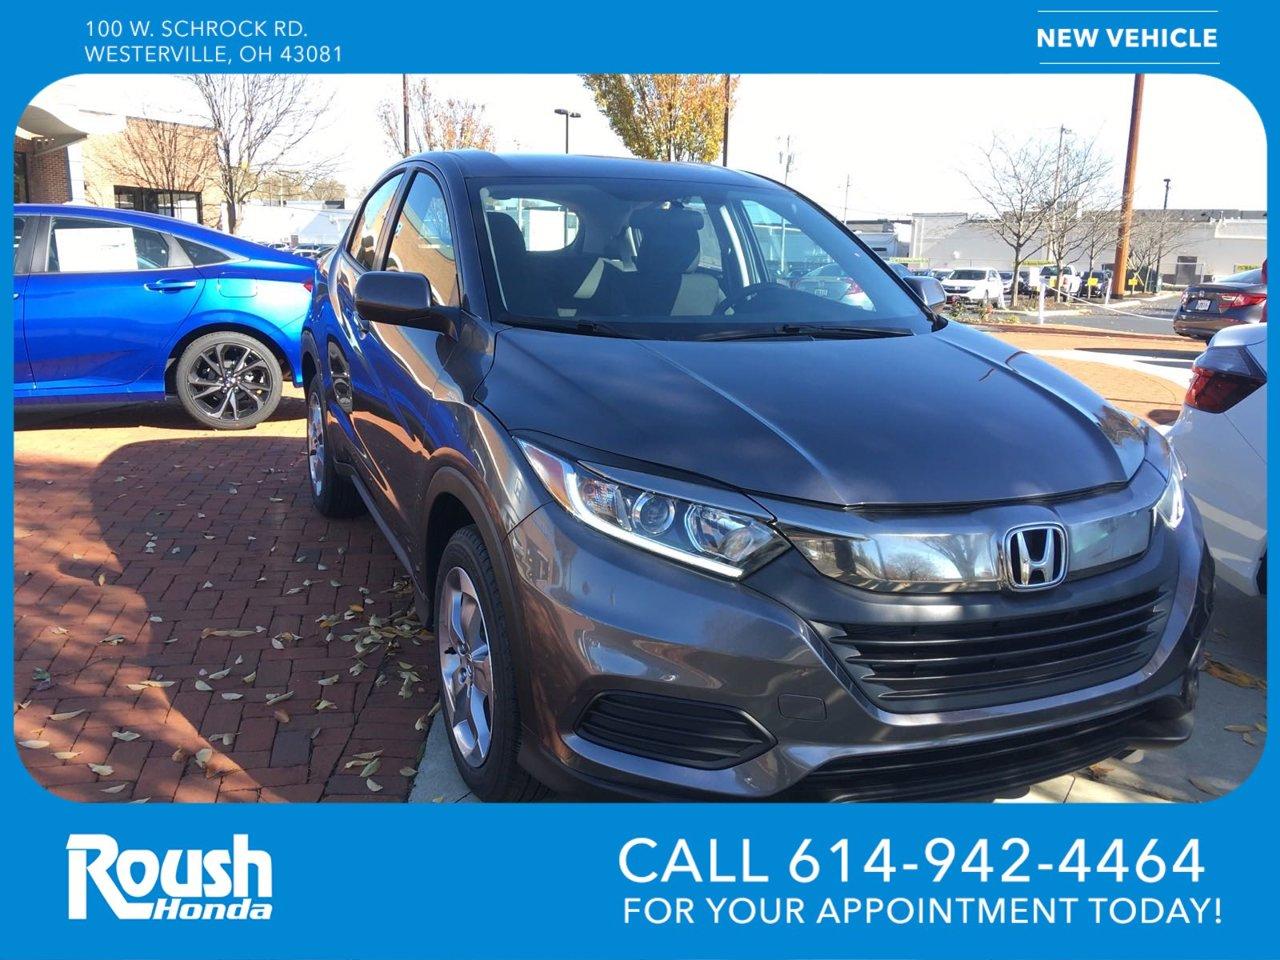 New 2021 Honda HR-V in Westerville, OH